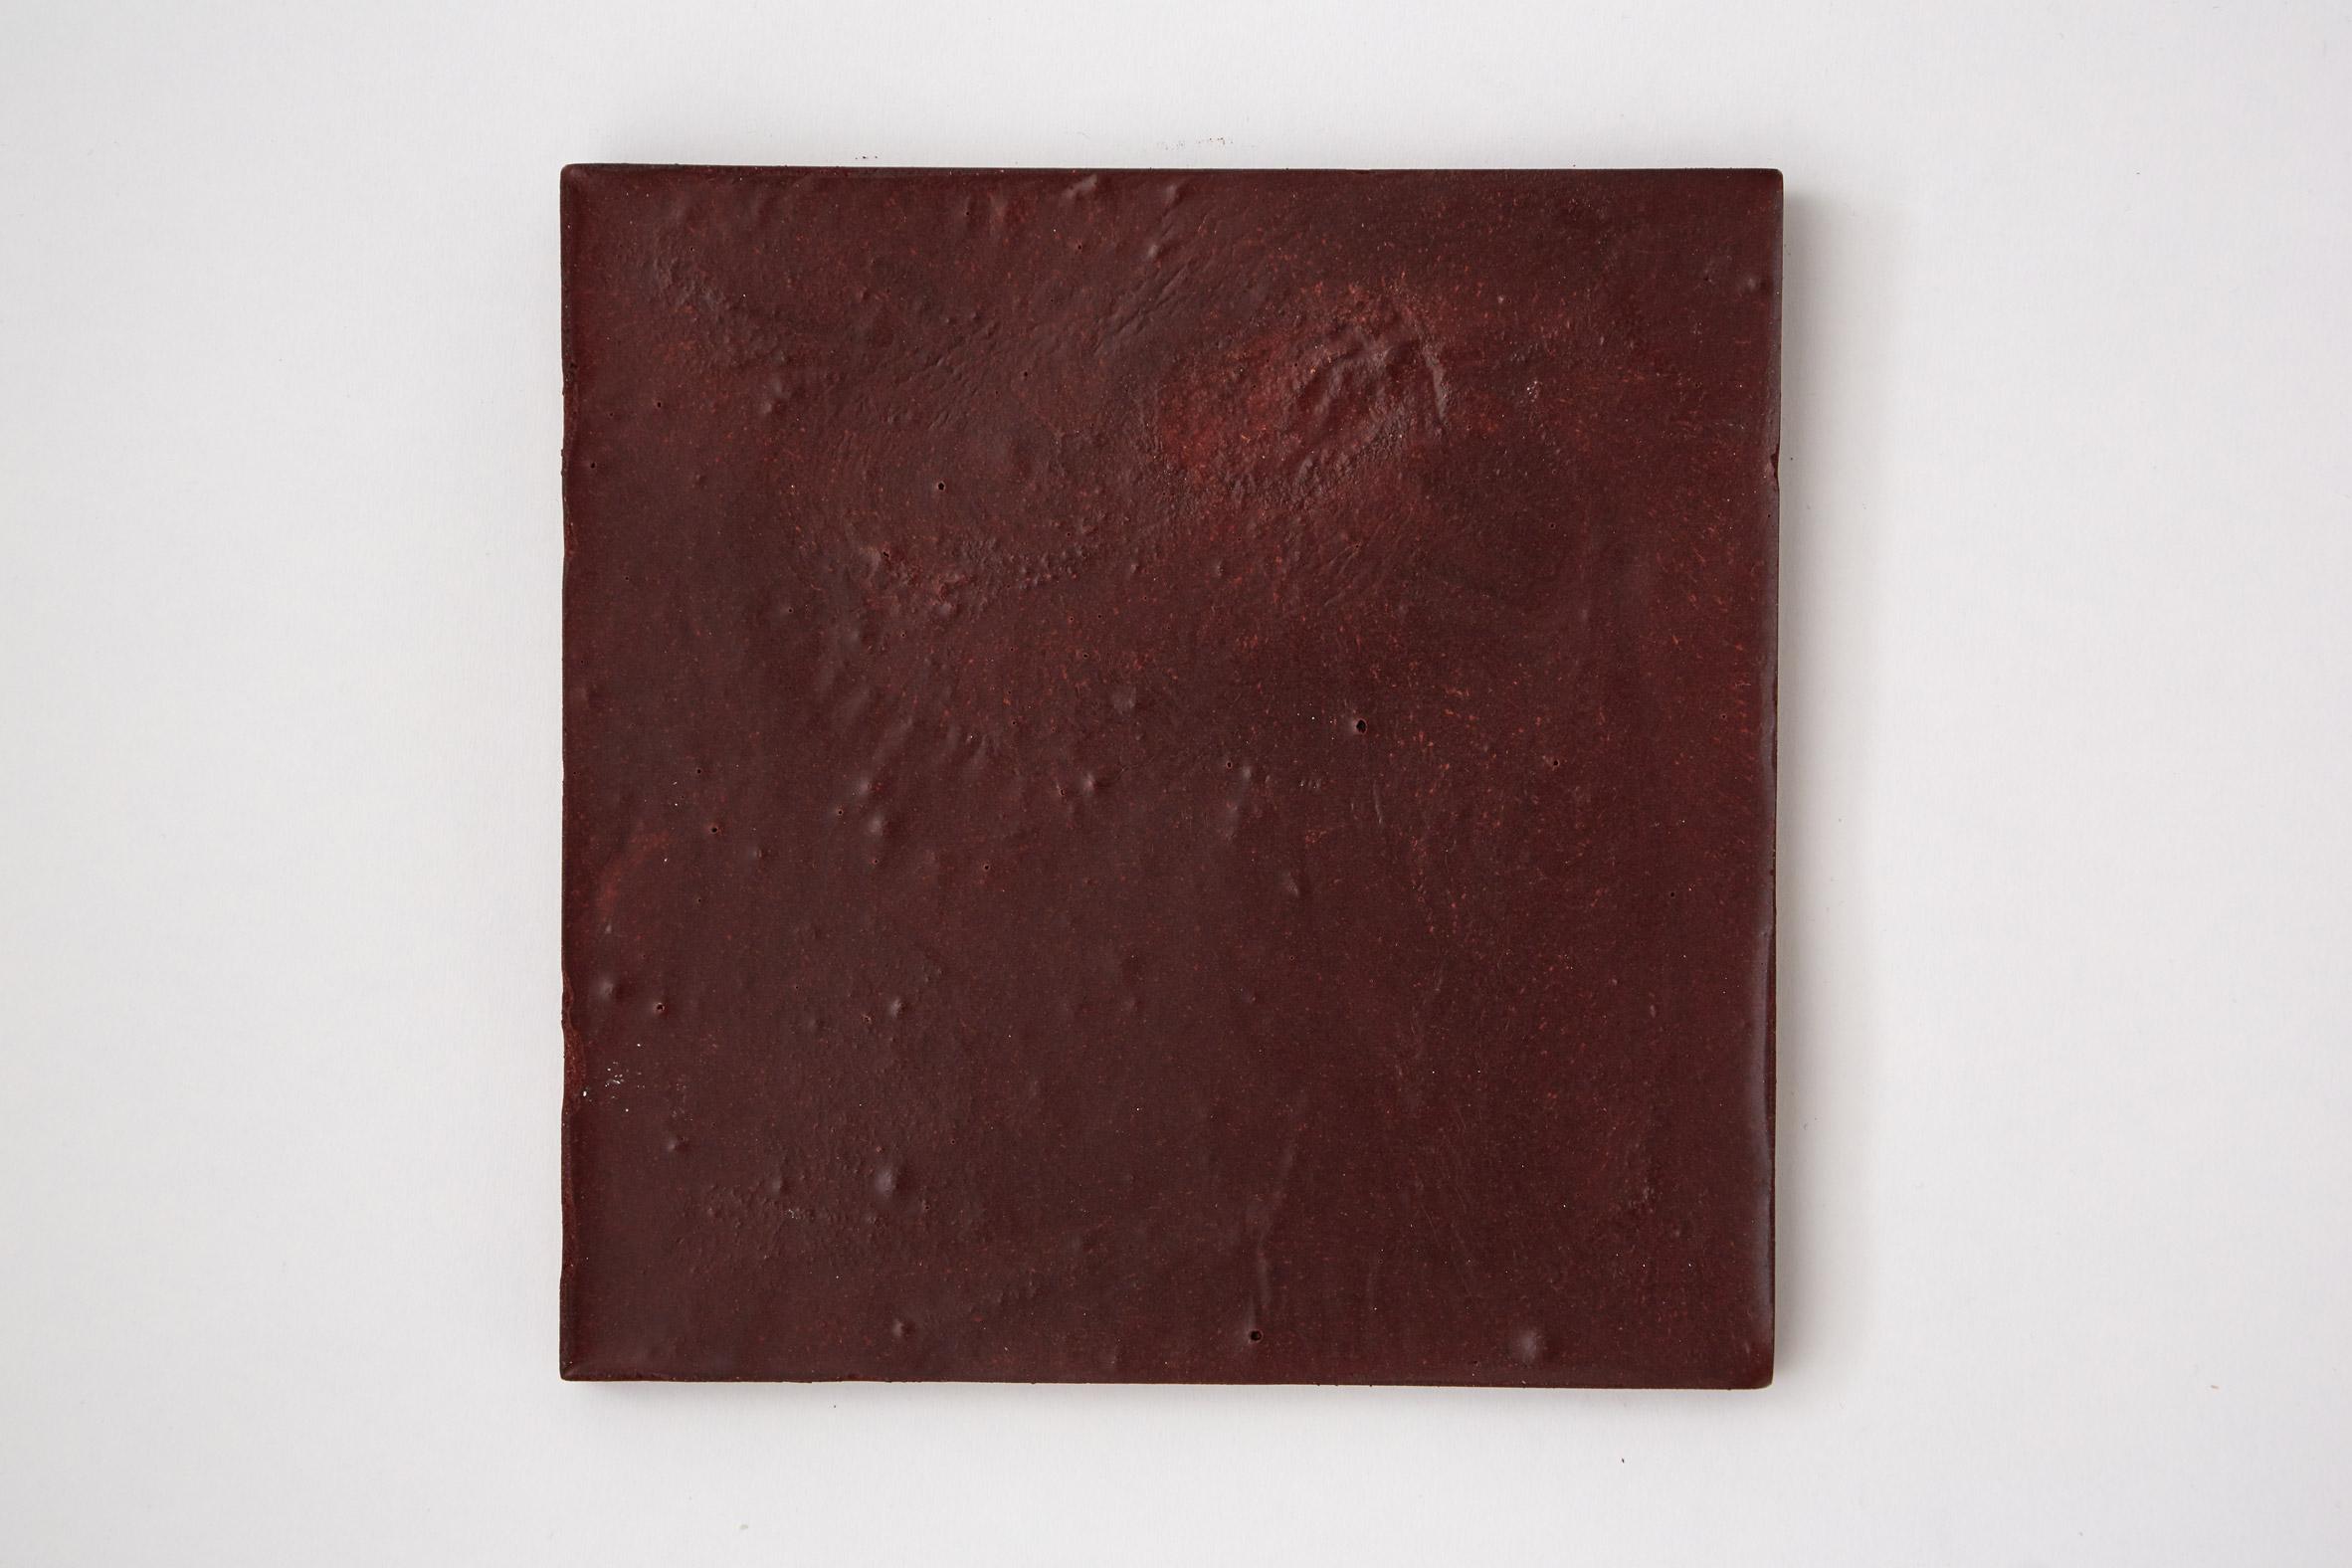 Dark red bio-concrete tile by Irene Roca Moracia and Brigitte Kock